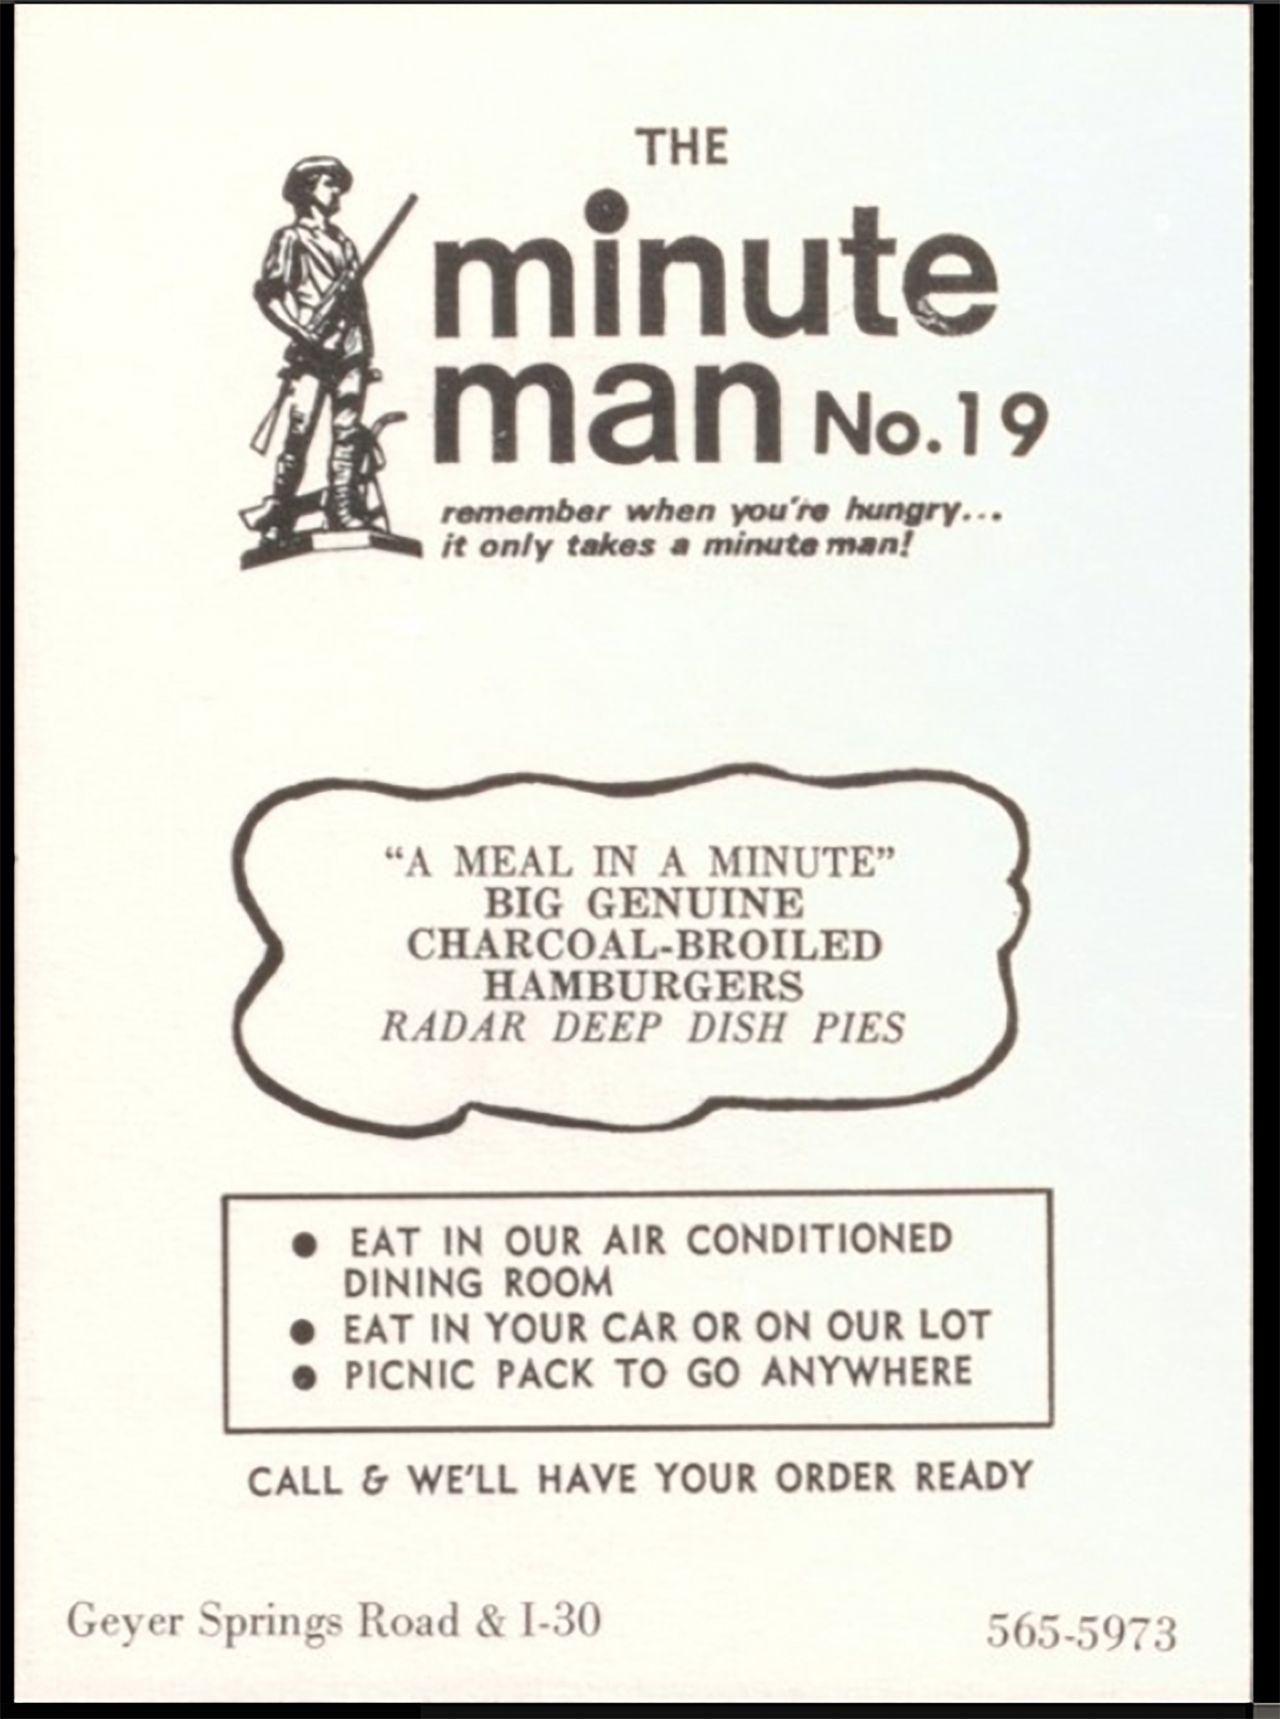 Vintage Minute Man No. 19 Menu